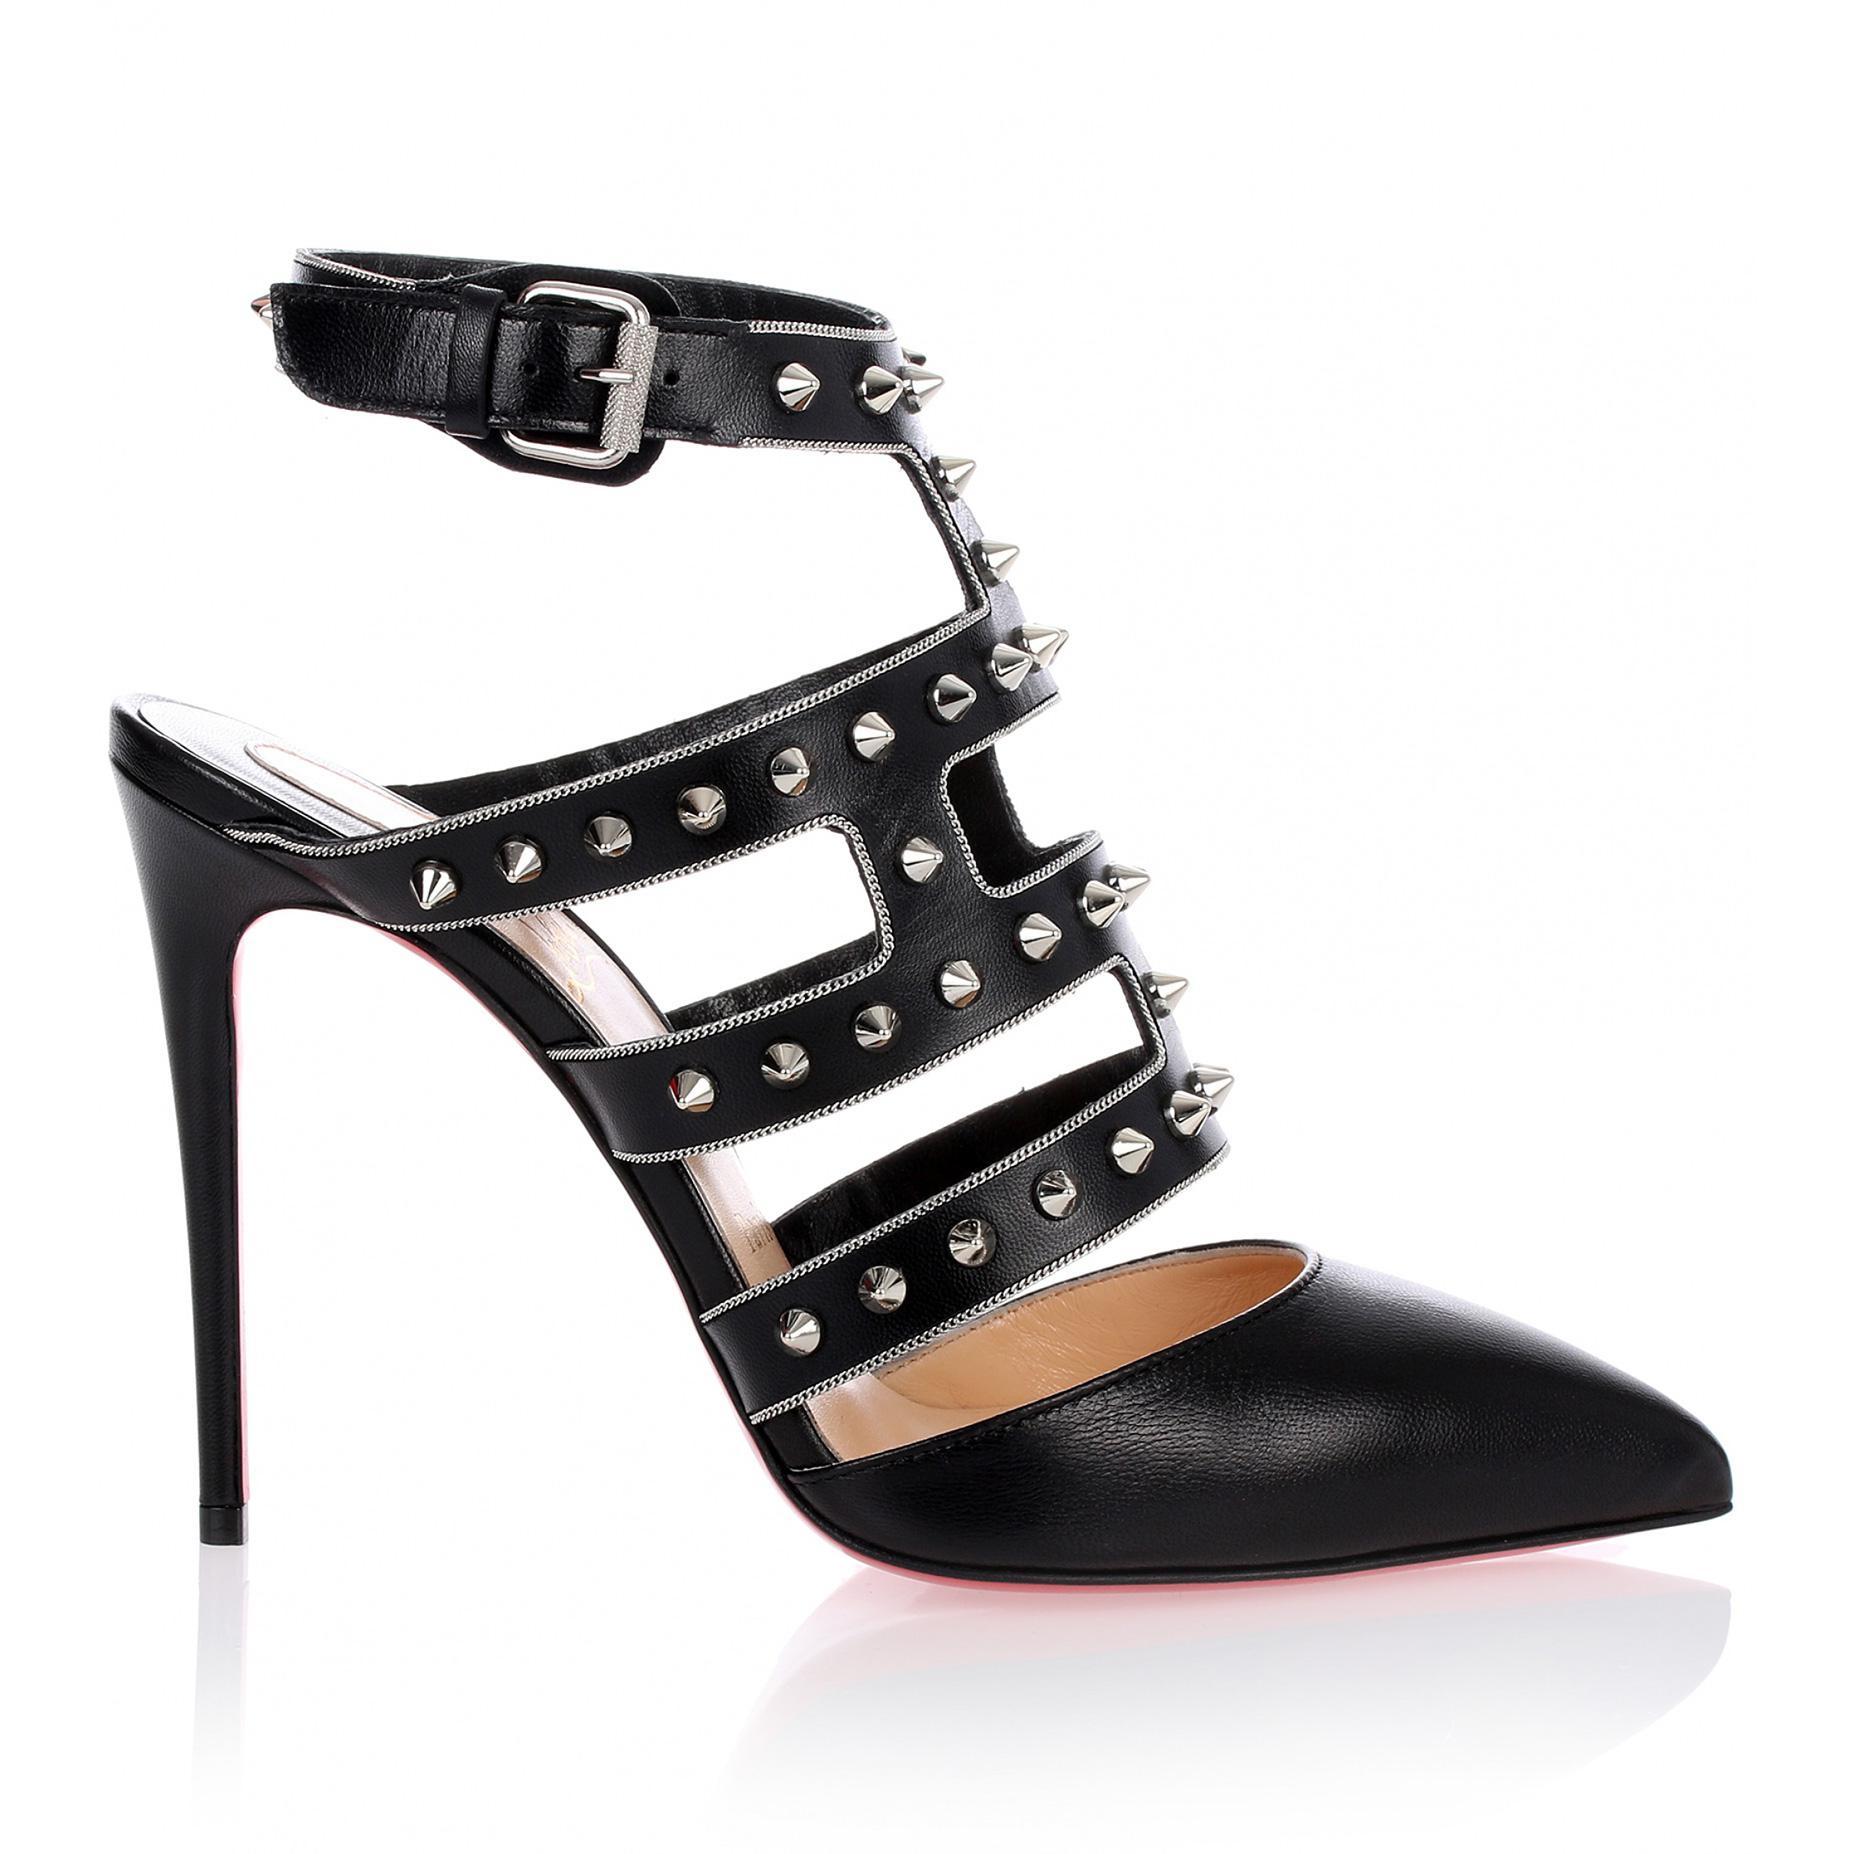 Tchicaboum black spikes sandal Christian Louboutin hot17U